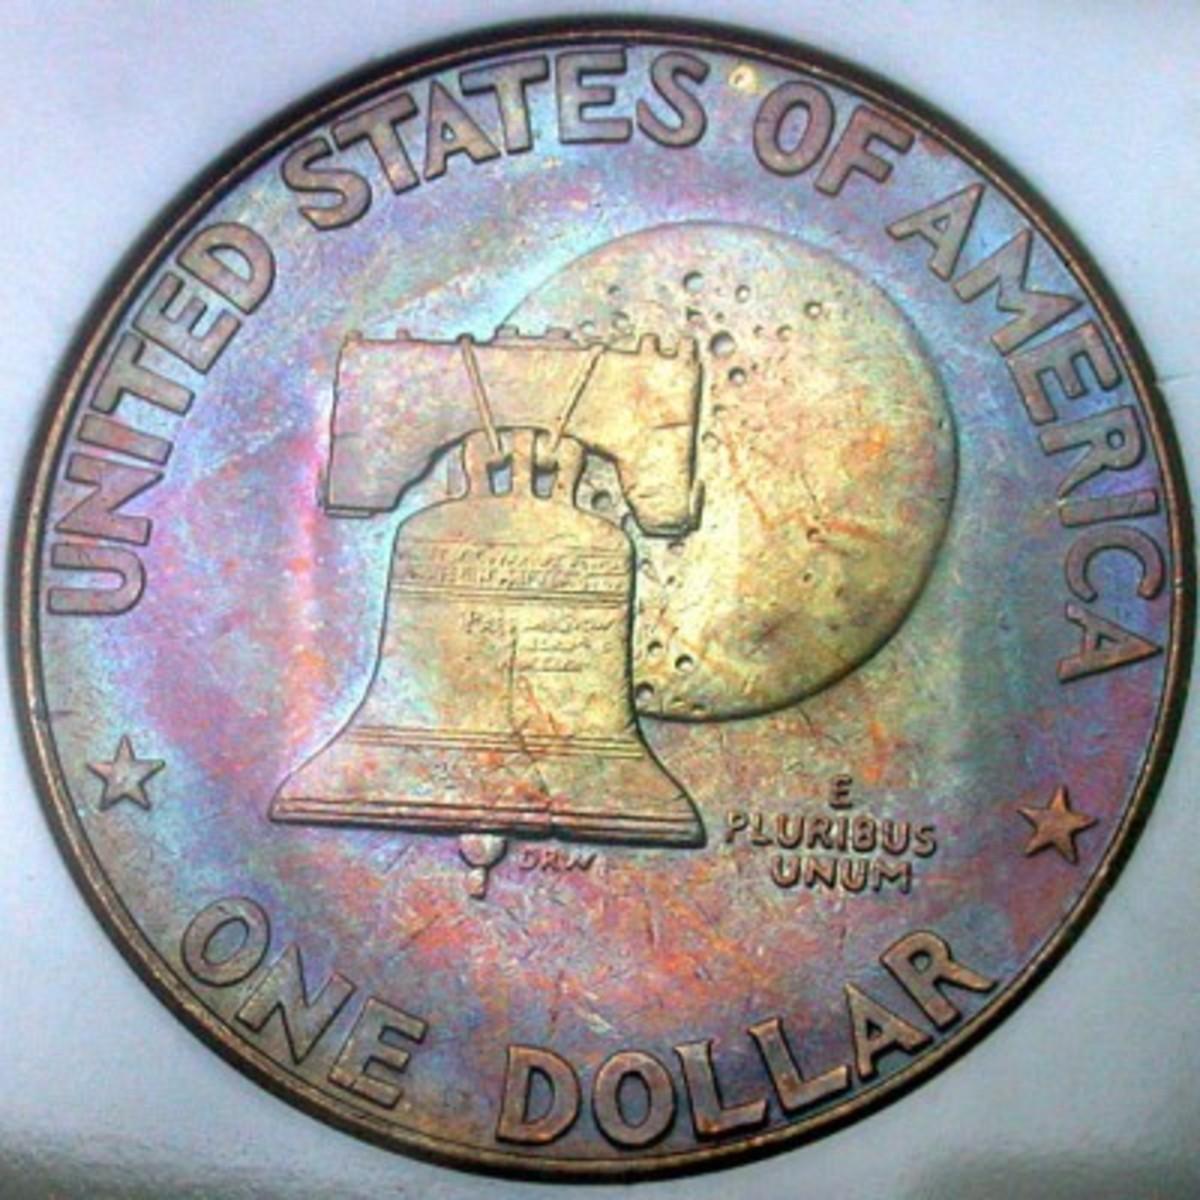 1976 Eisenhower Dollar Variety 1. Photo Courtesy Coinpage.com